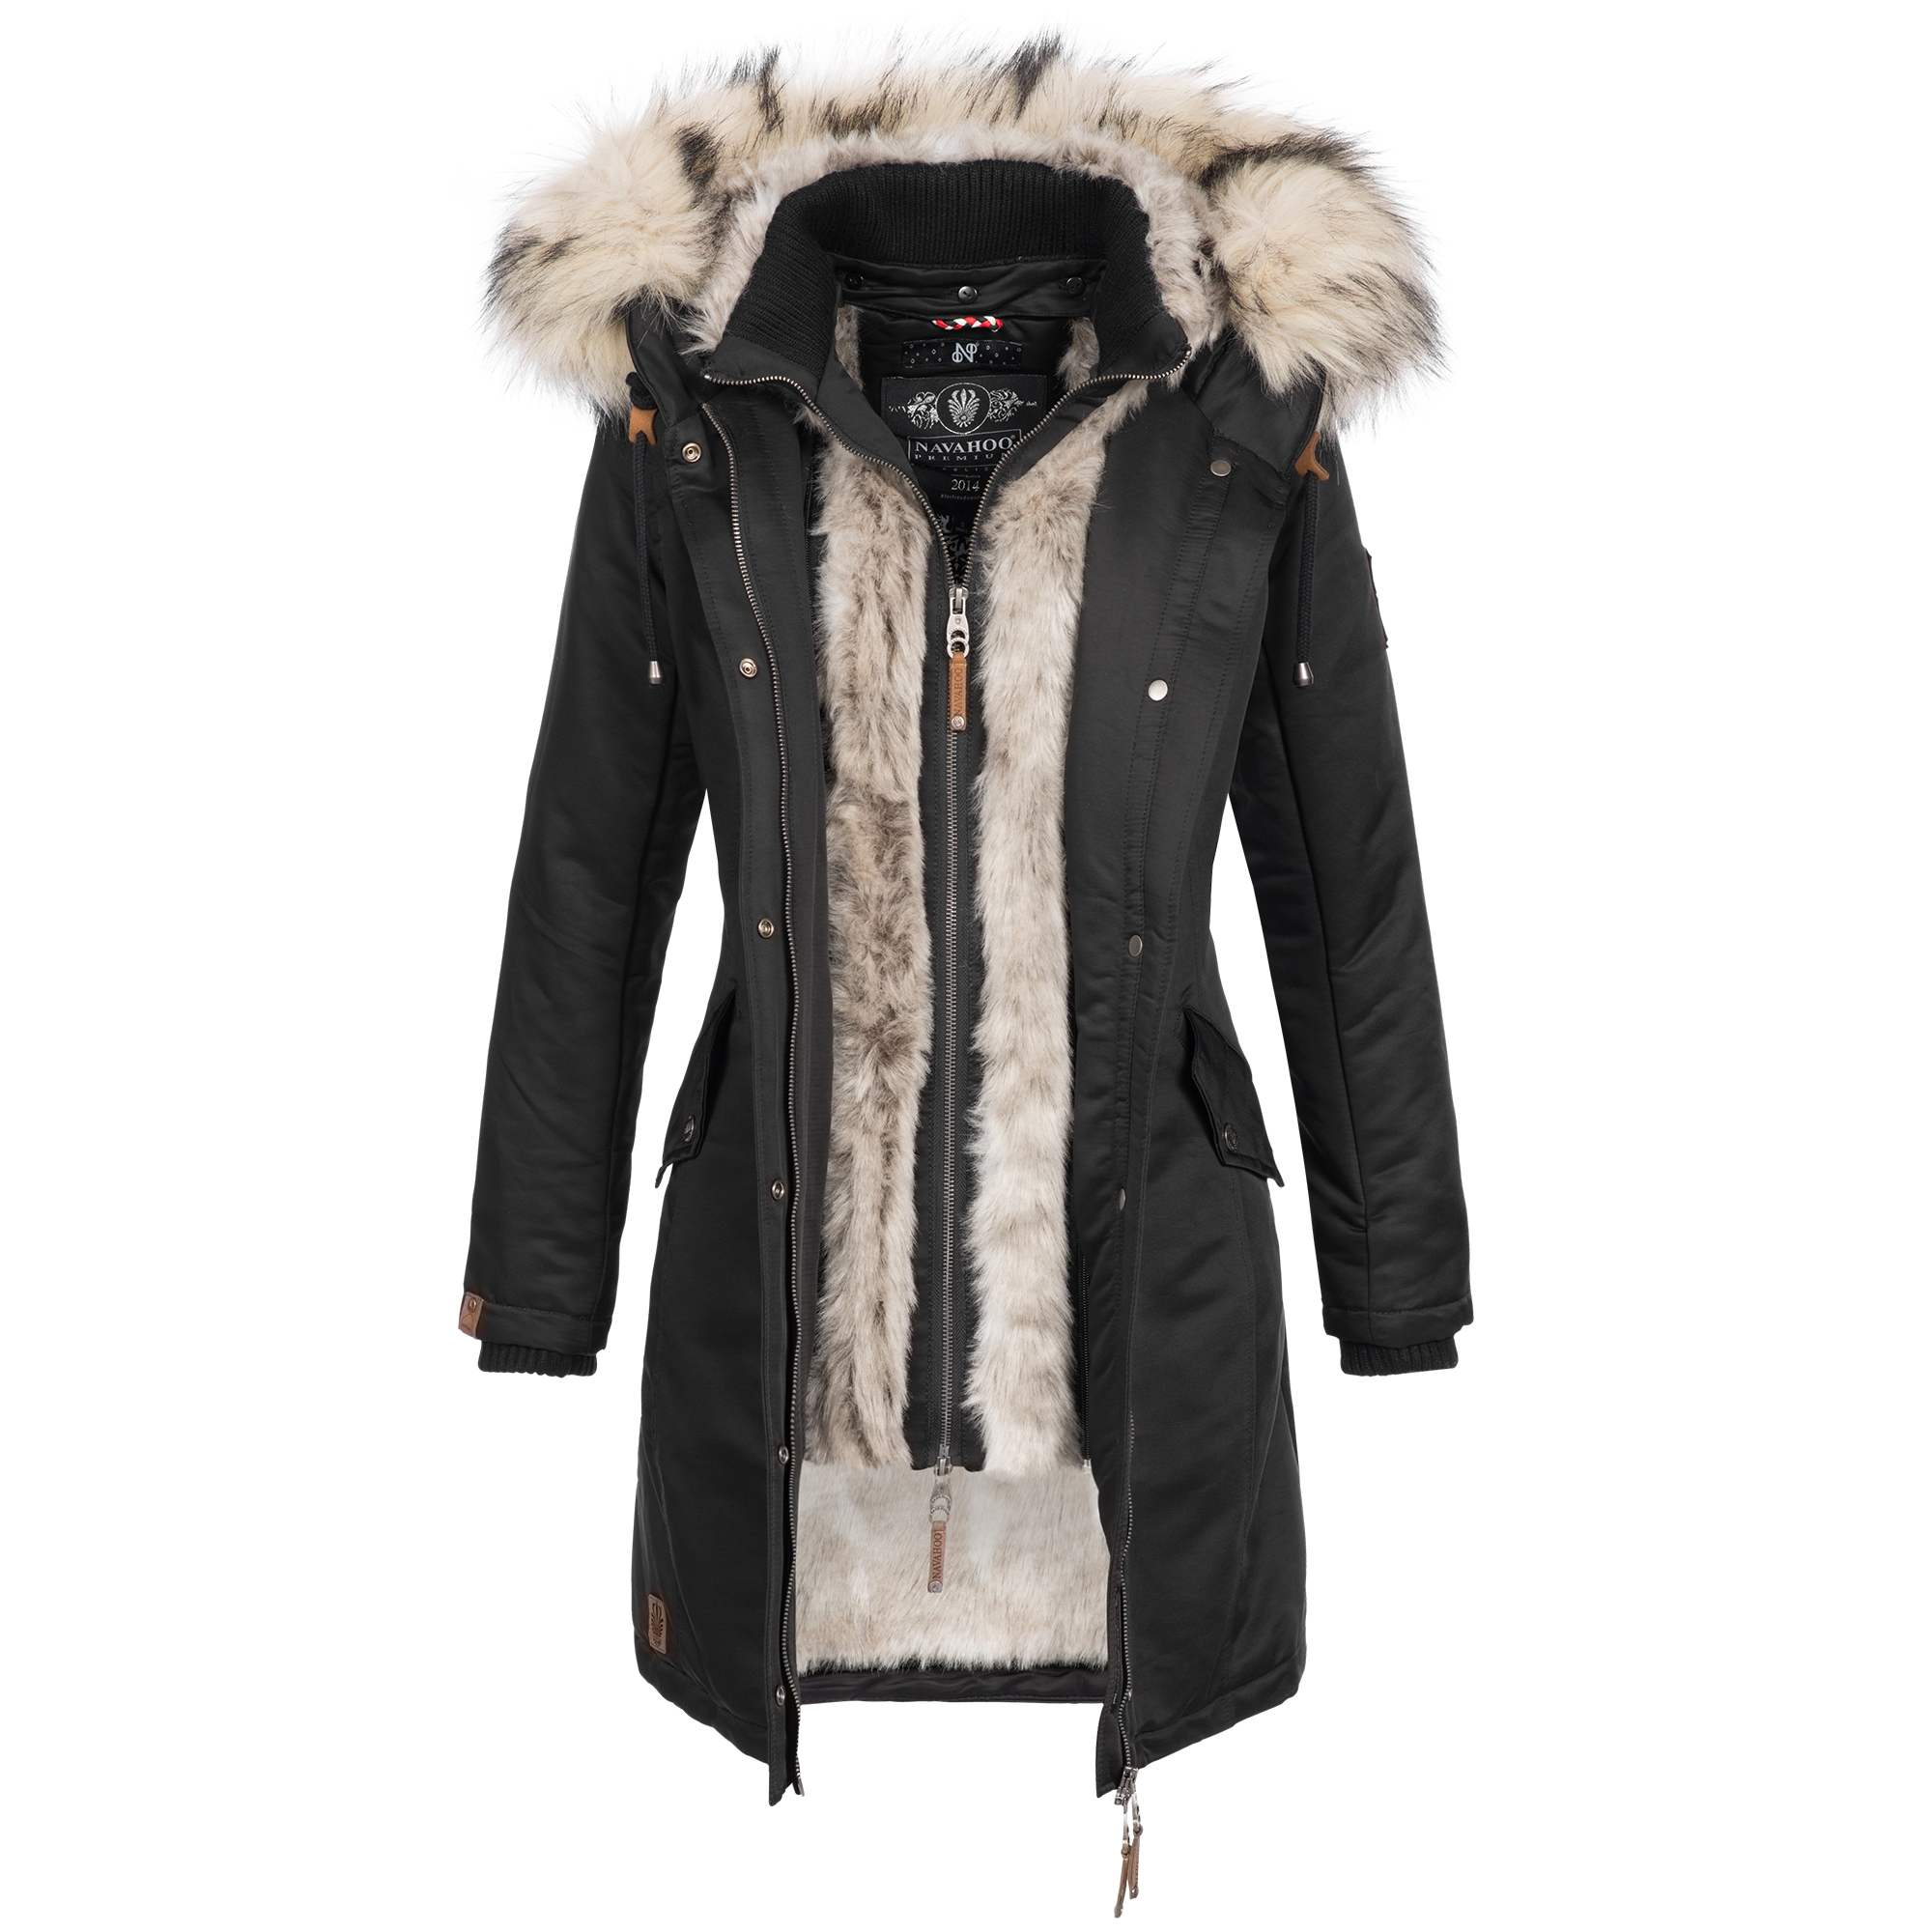 Parka Damen Luxus Winterjacke Navahoo Winter Mantel Jacke vb7gYyf6